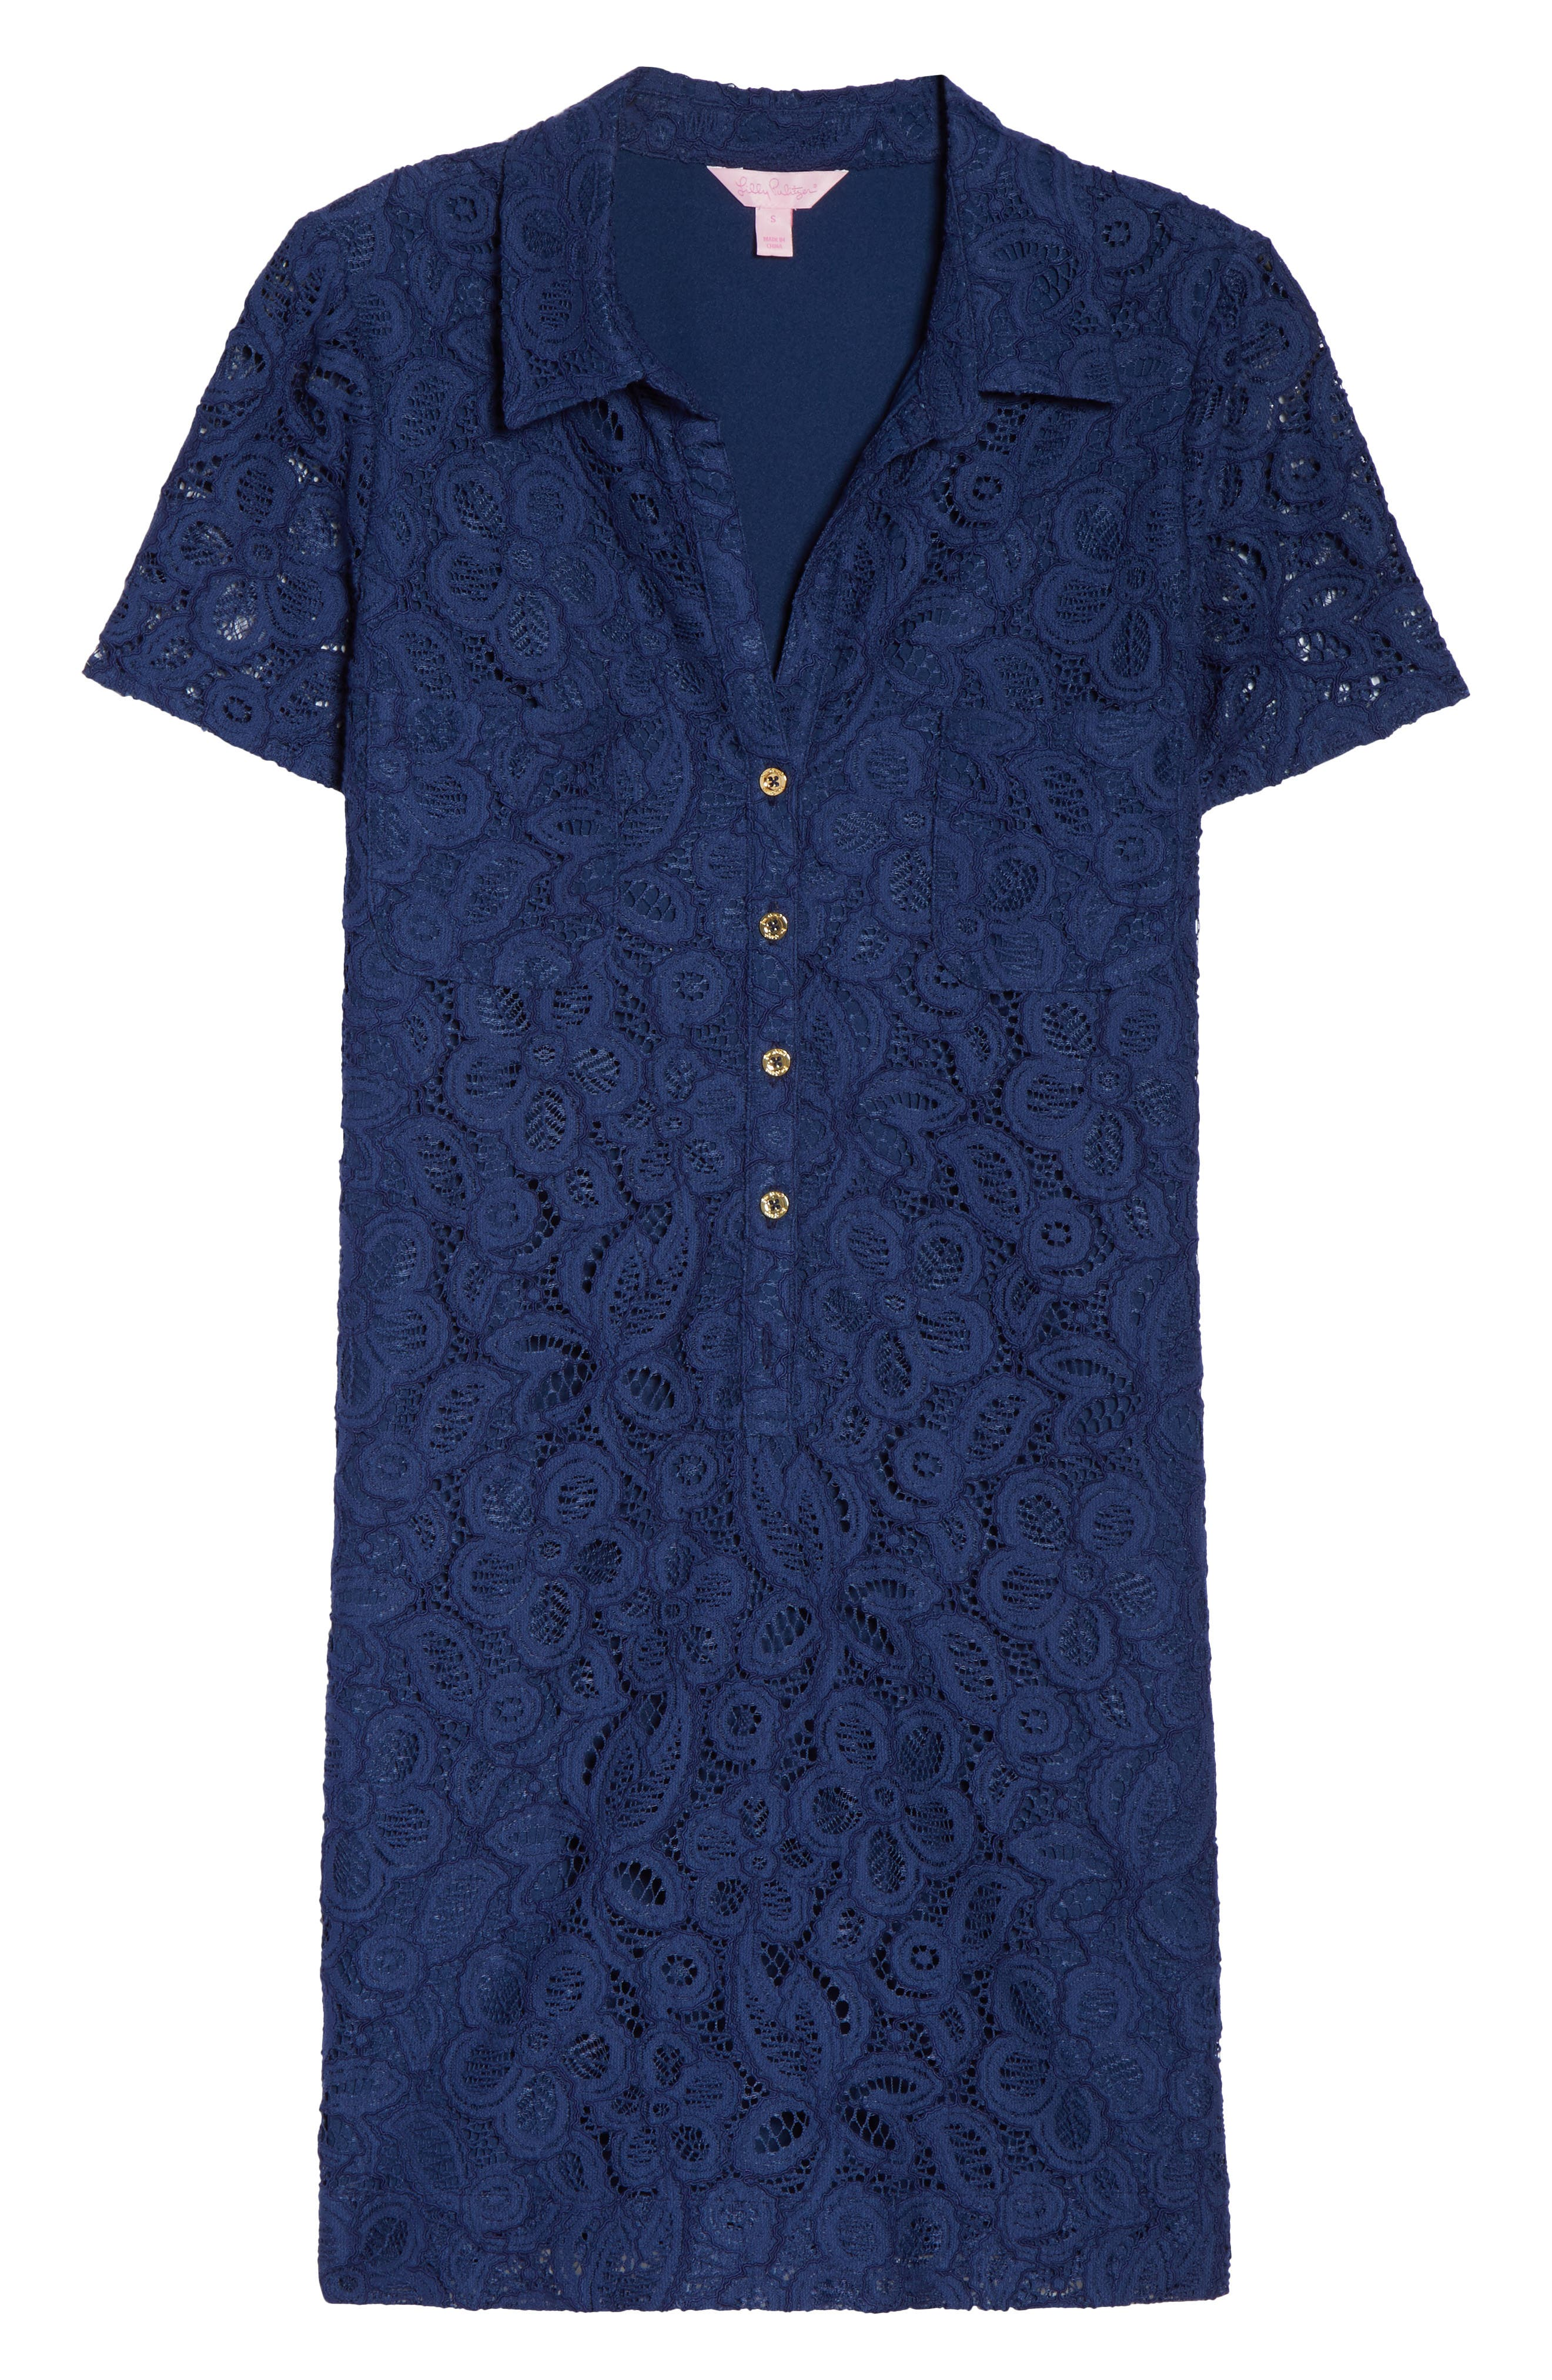 Nelle Shirtdress,                             Alternate thumbnail 6, color,                             High Tide Floral Pop Lace